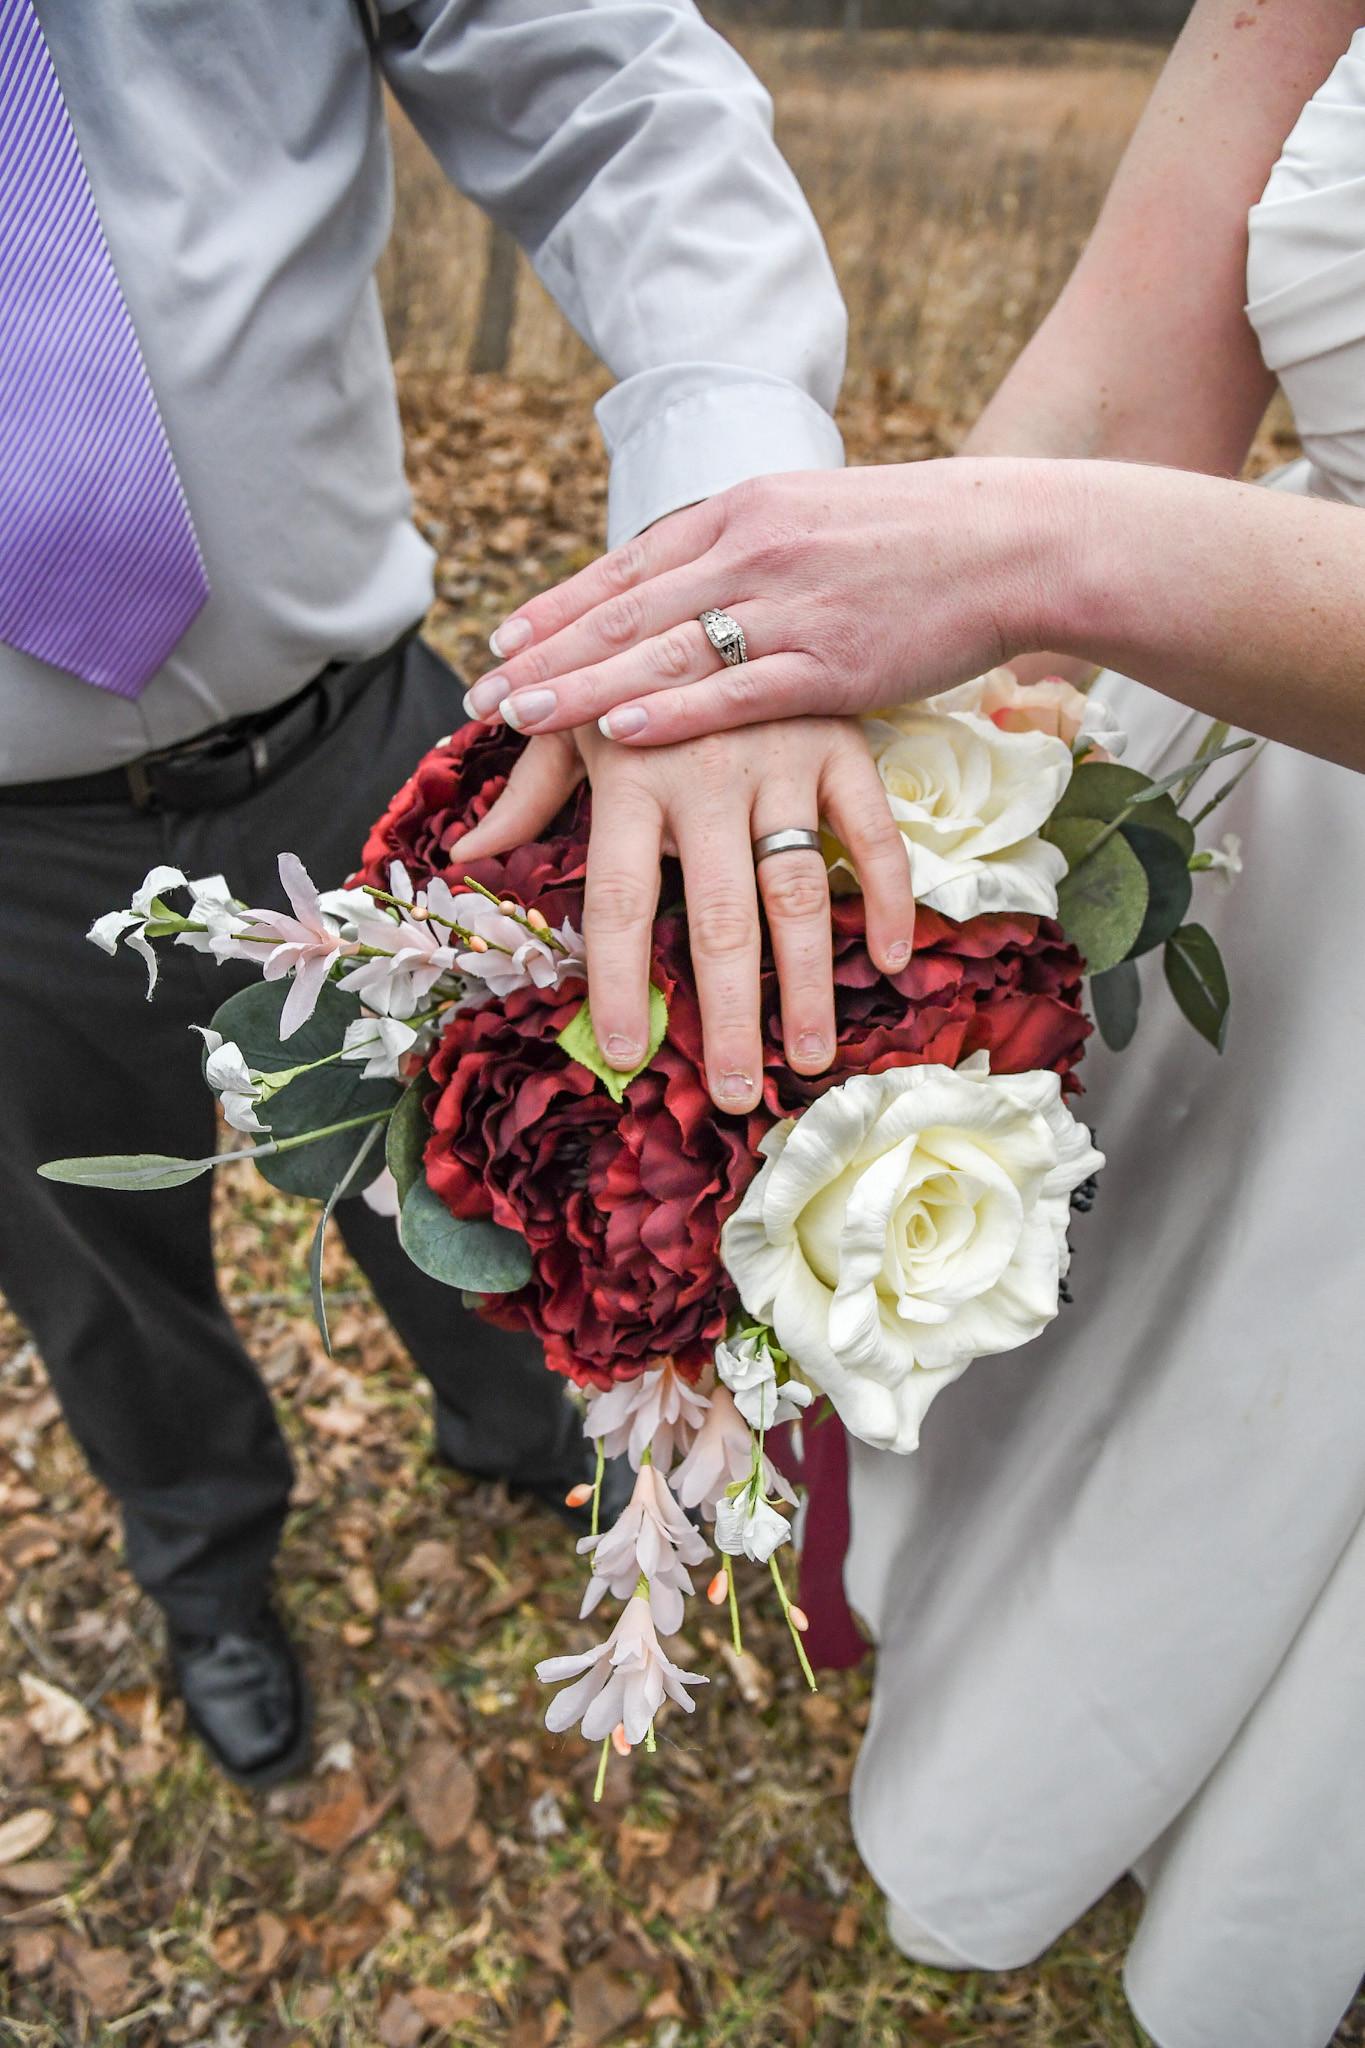 Wedding Video (8 hours)